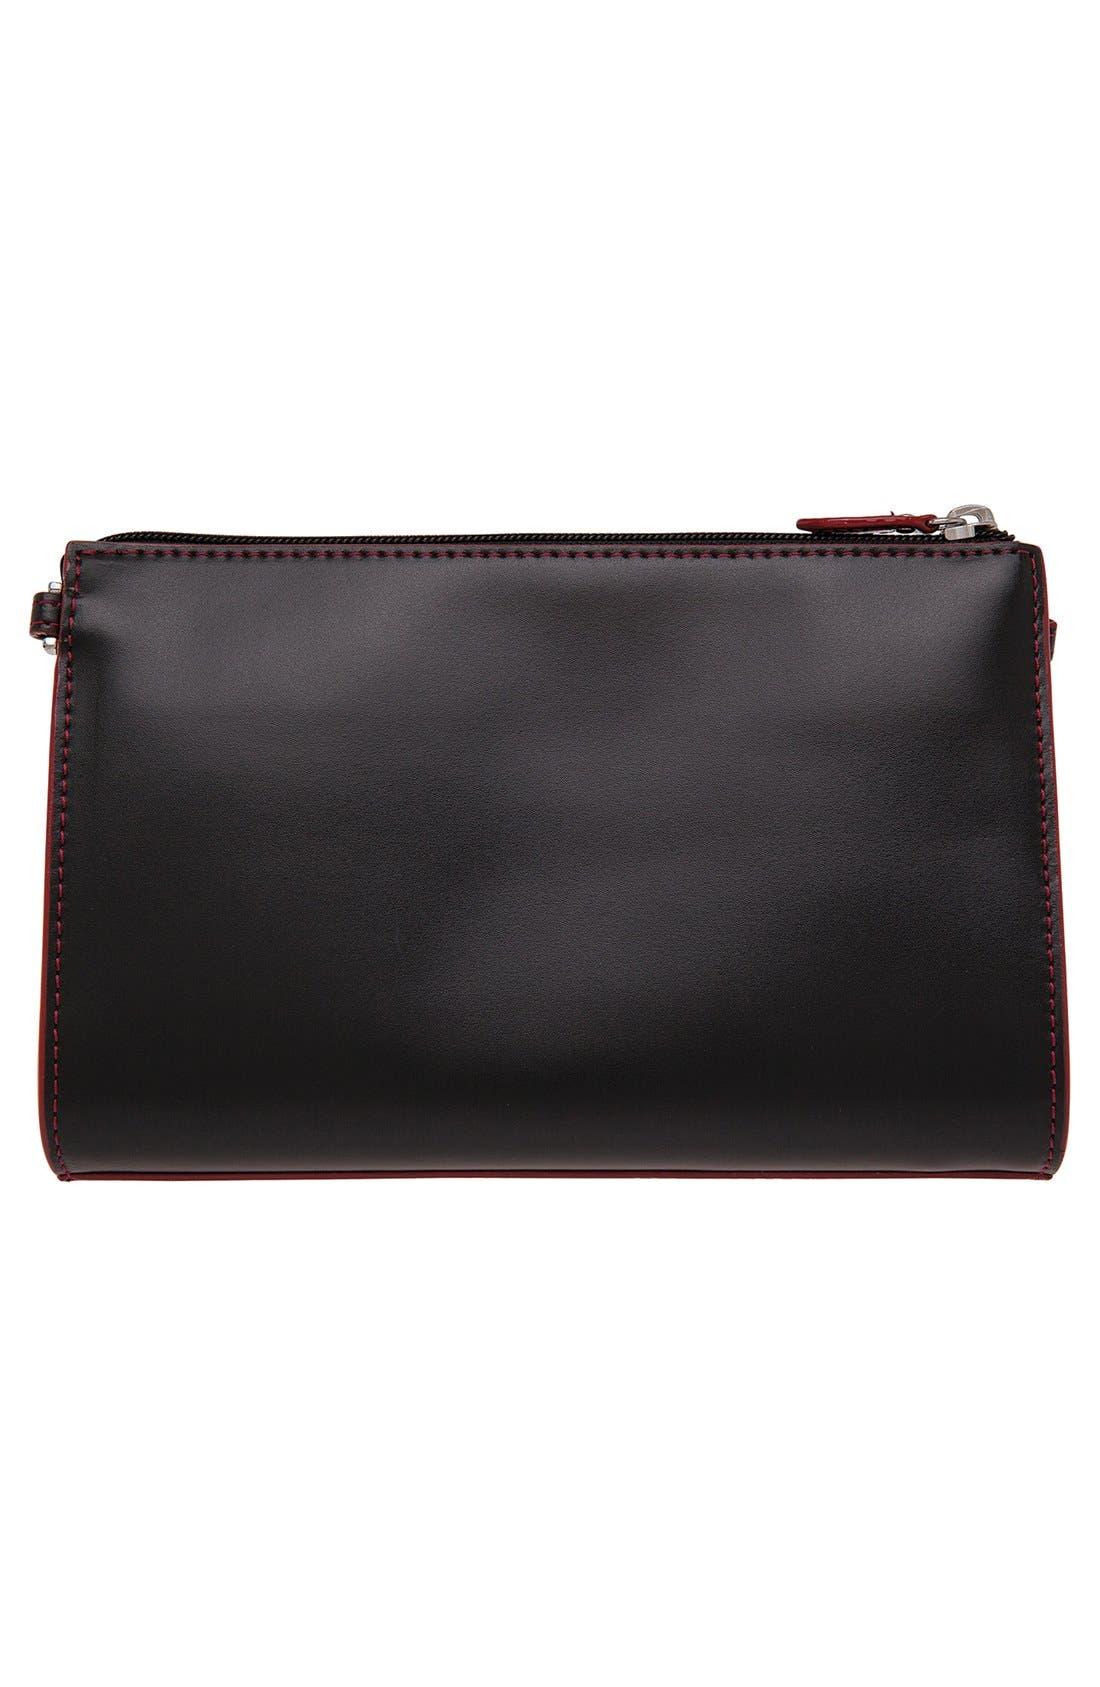 Lodis'Audrey Collection -Vicky' ConvertibleCrossbody Bag,                             Alternate thumbnail 4, color,                             001